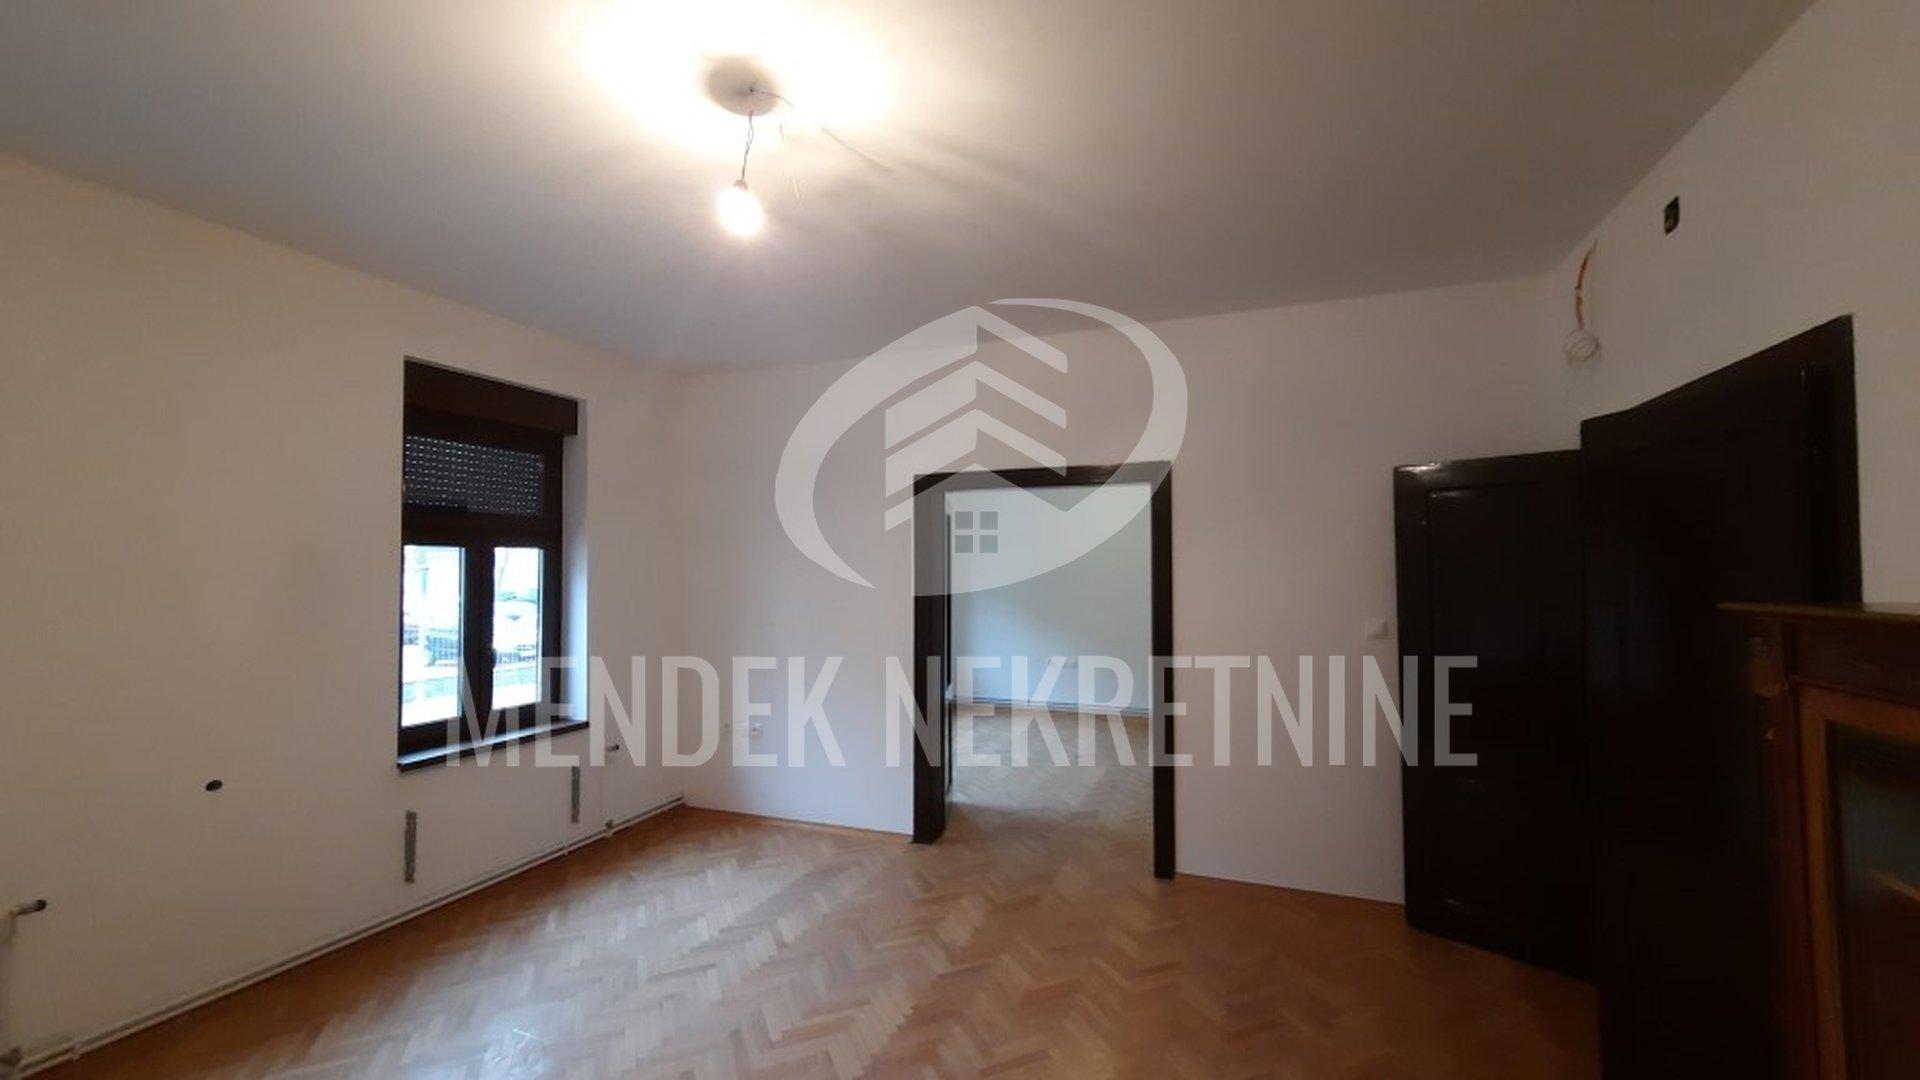 Uffici, 150 m2, Affitto, Varaždin - Centar